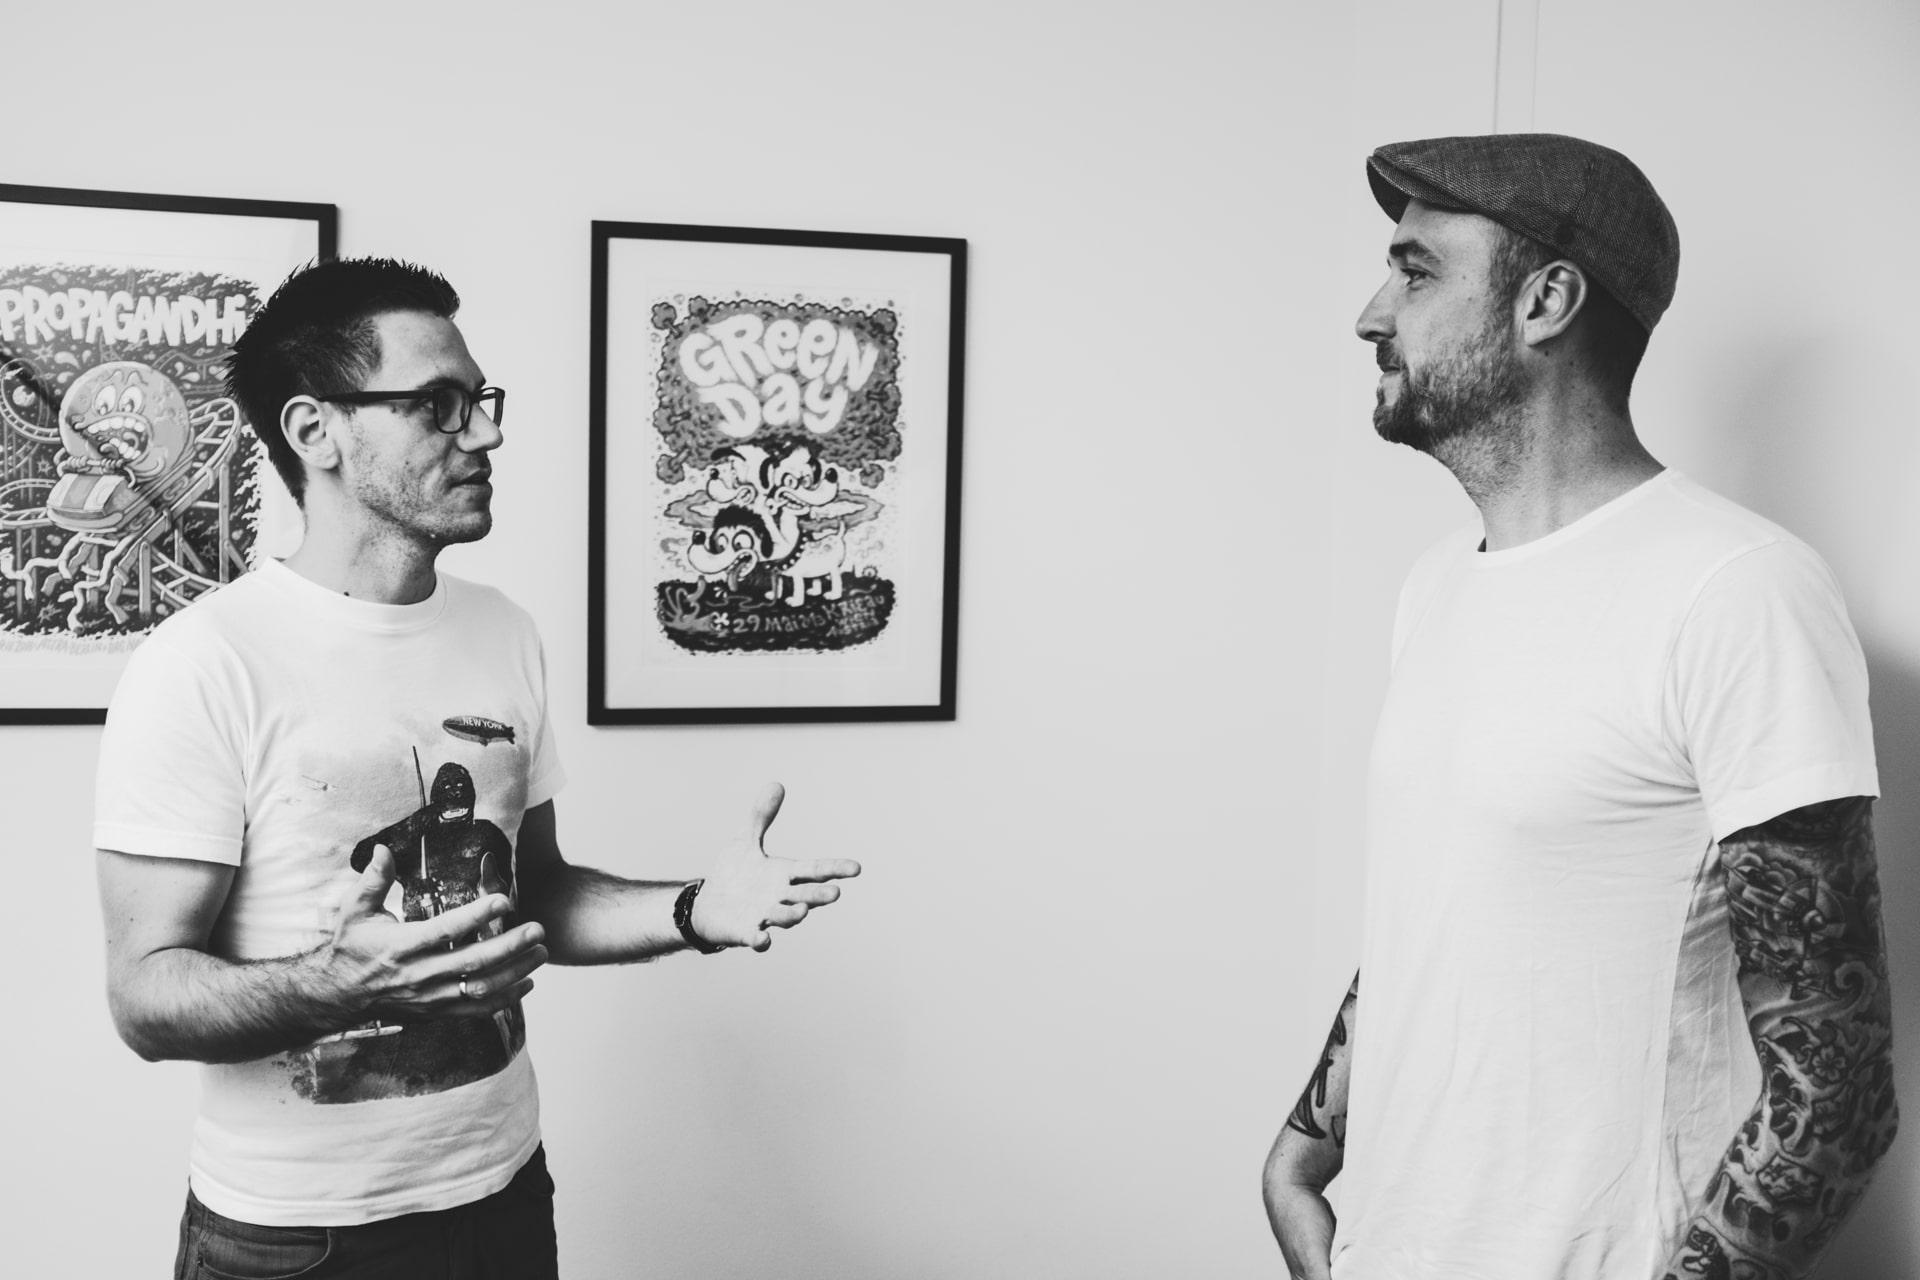 Dominik Wachholder (flink) im Interview mit Florian kozak (Johnny Be Good)